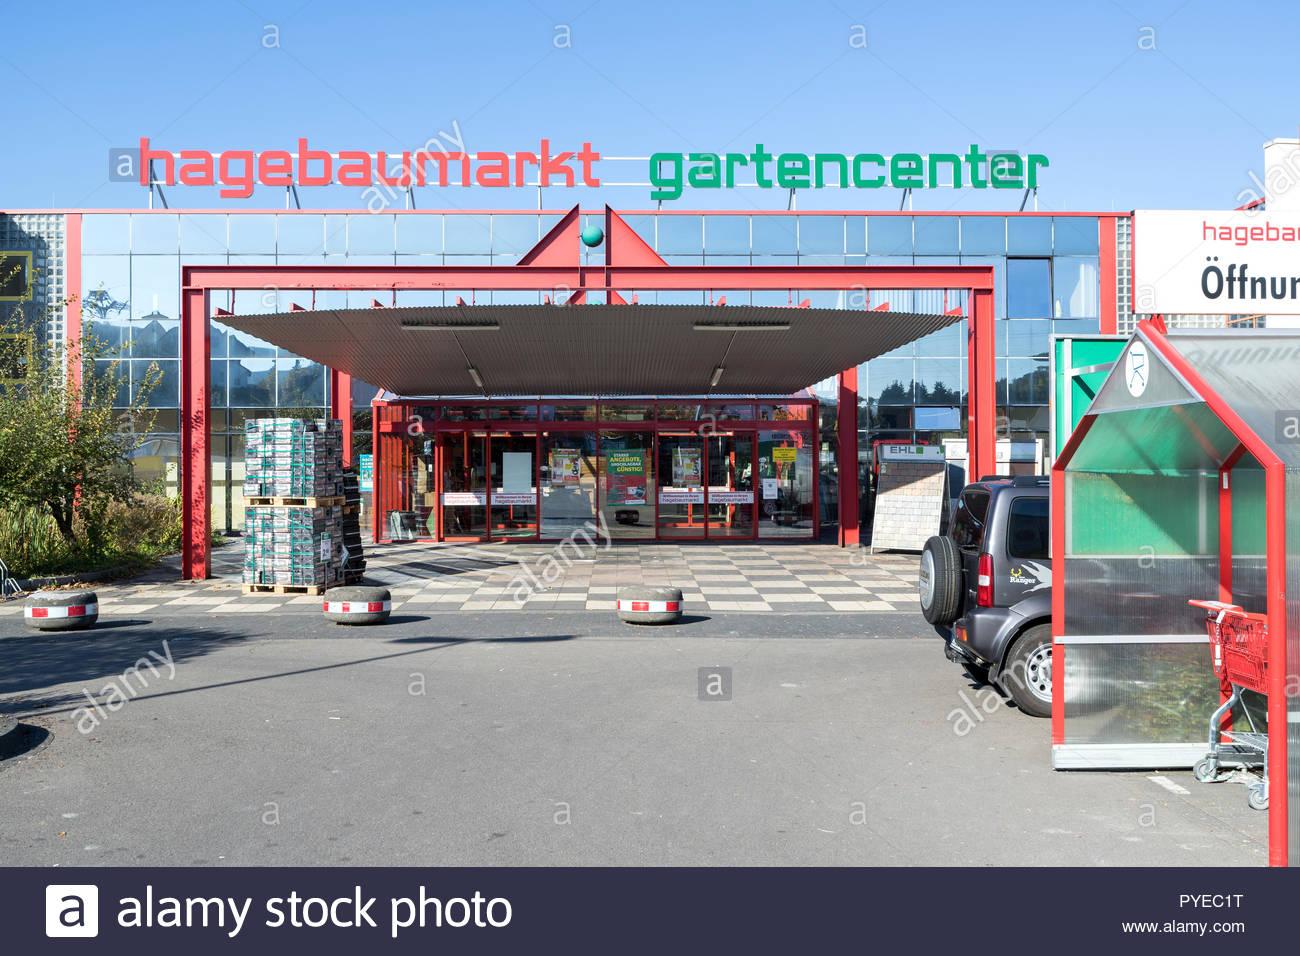 hagebaumarkt hardware store with garden center hagebaumarkt is a german diy store chain offering home improvement and do it yourself goods PYEC1T